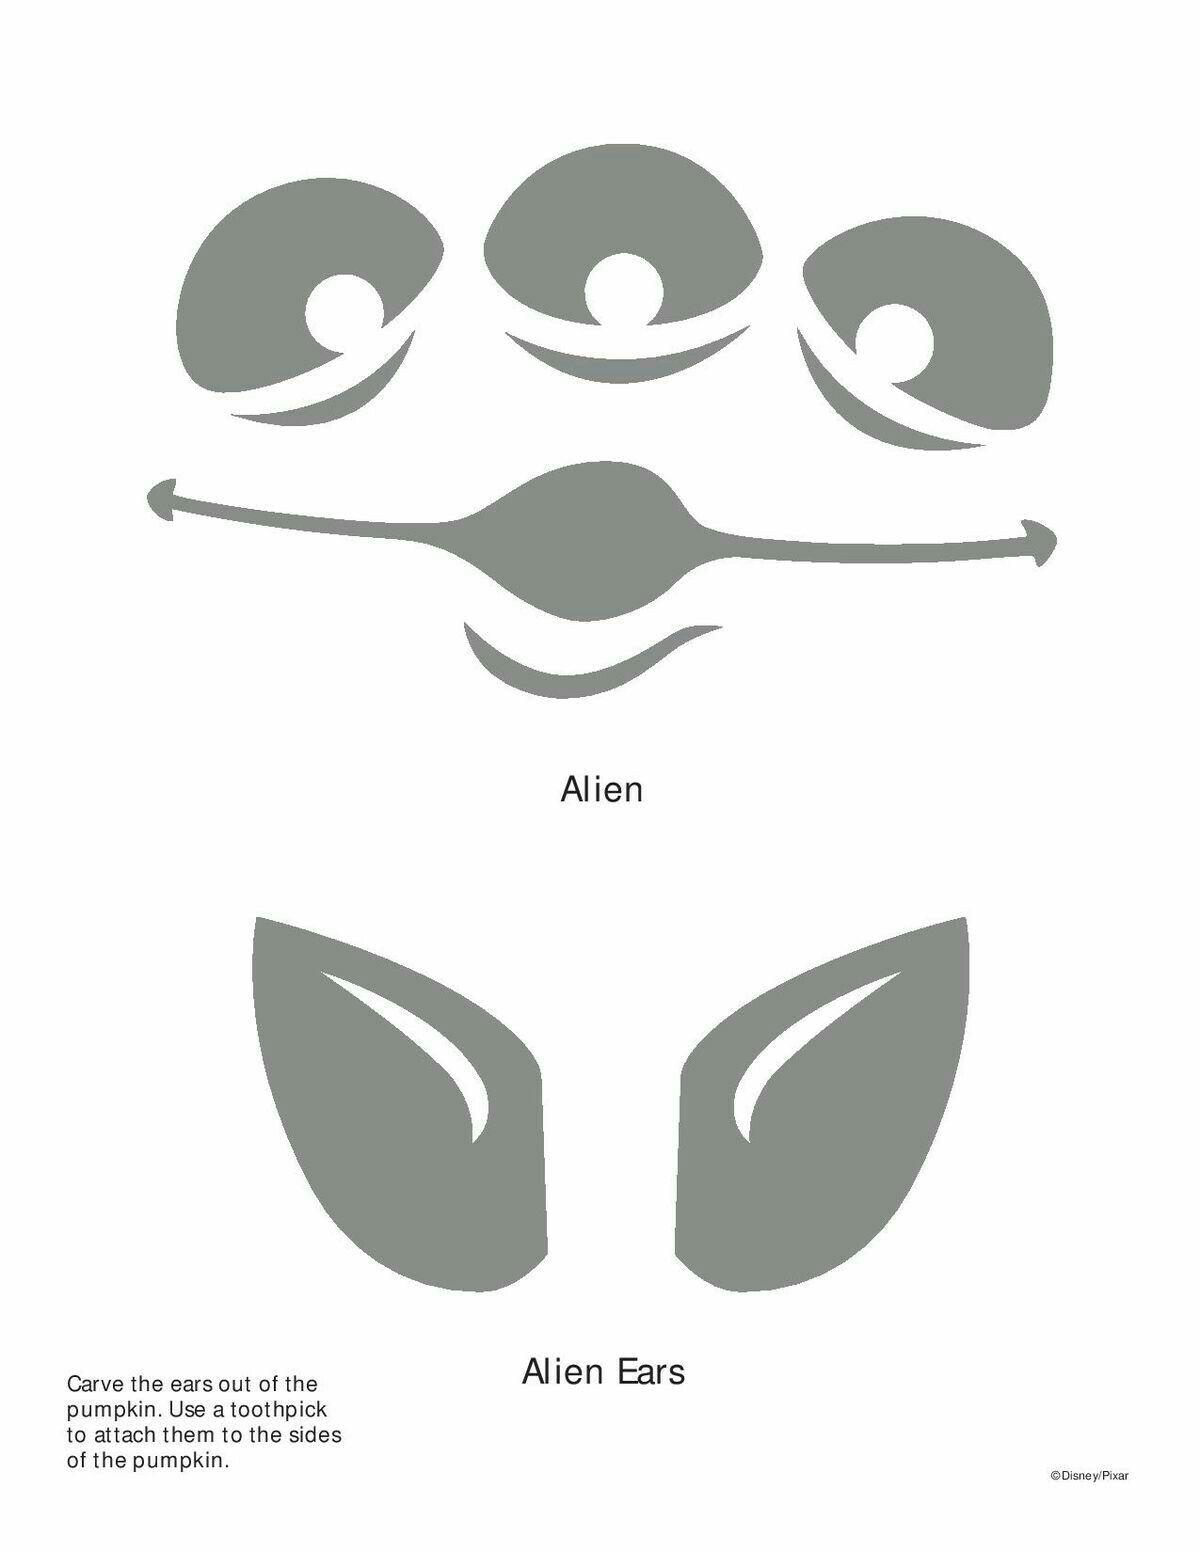 Alien Pumpkin Carving Template In